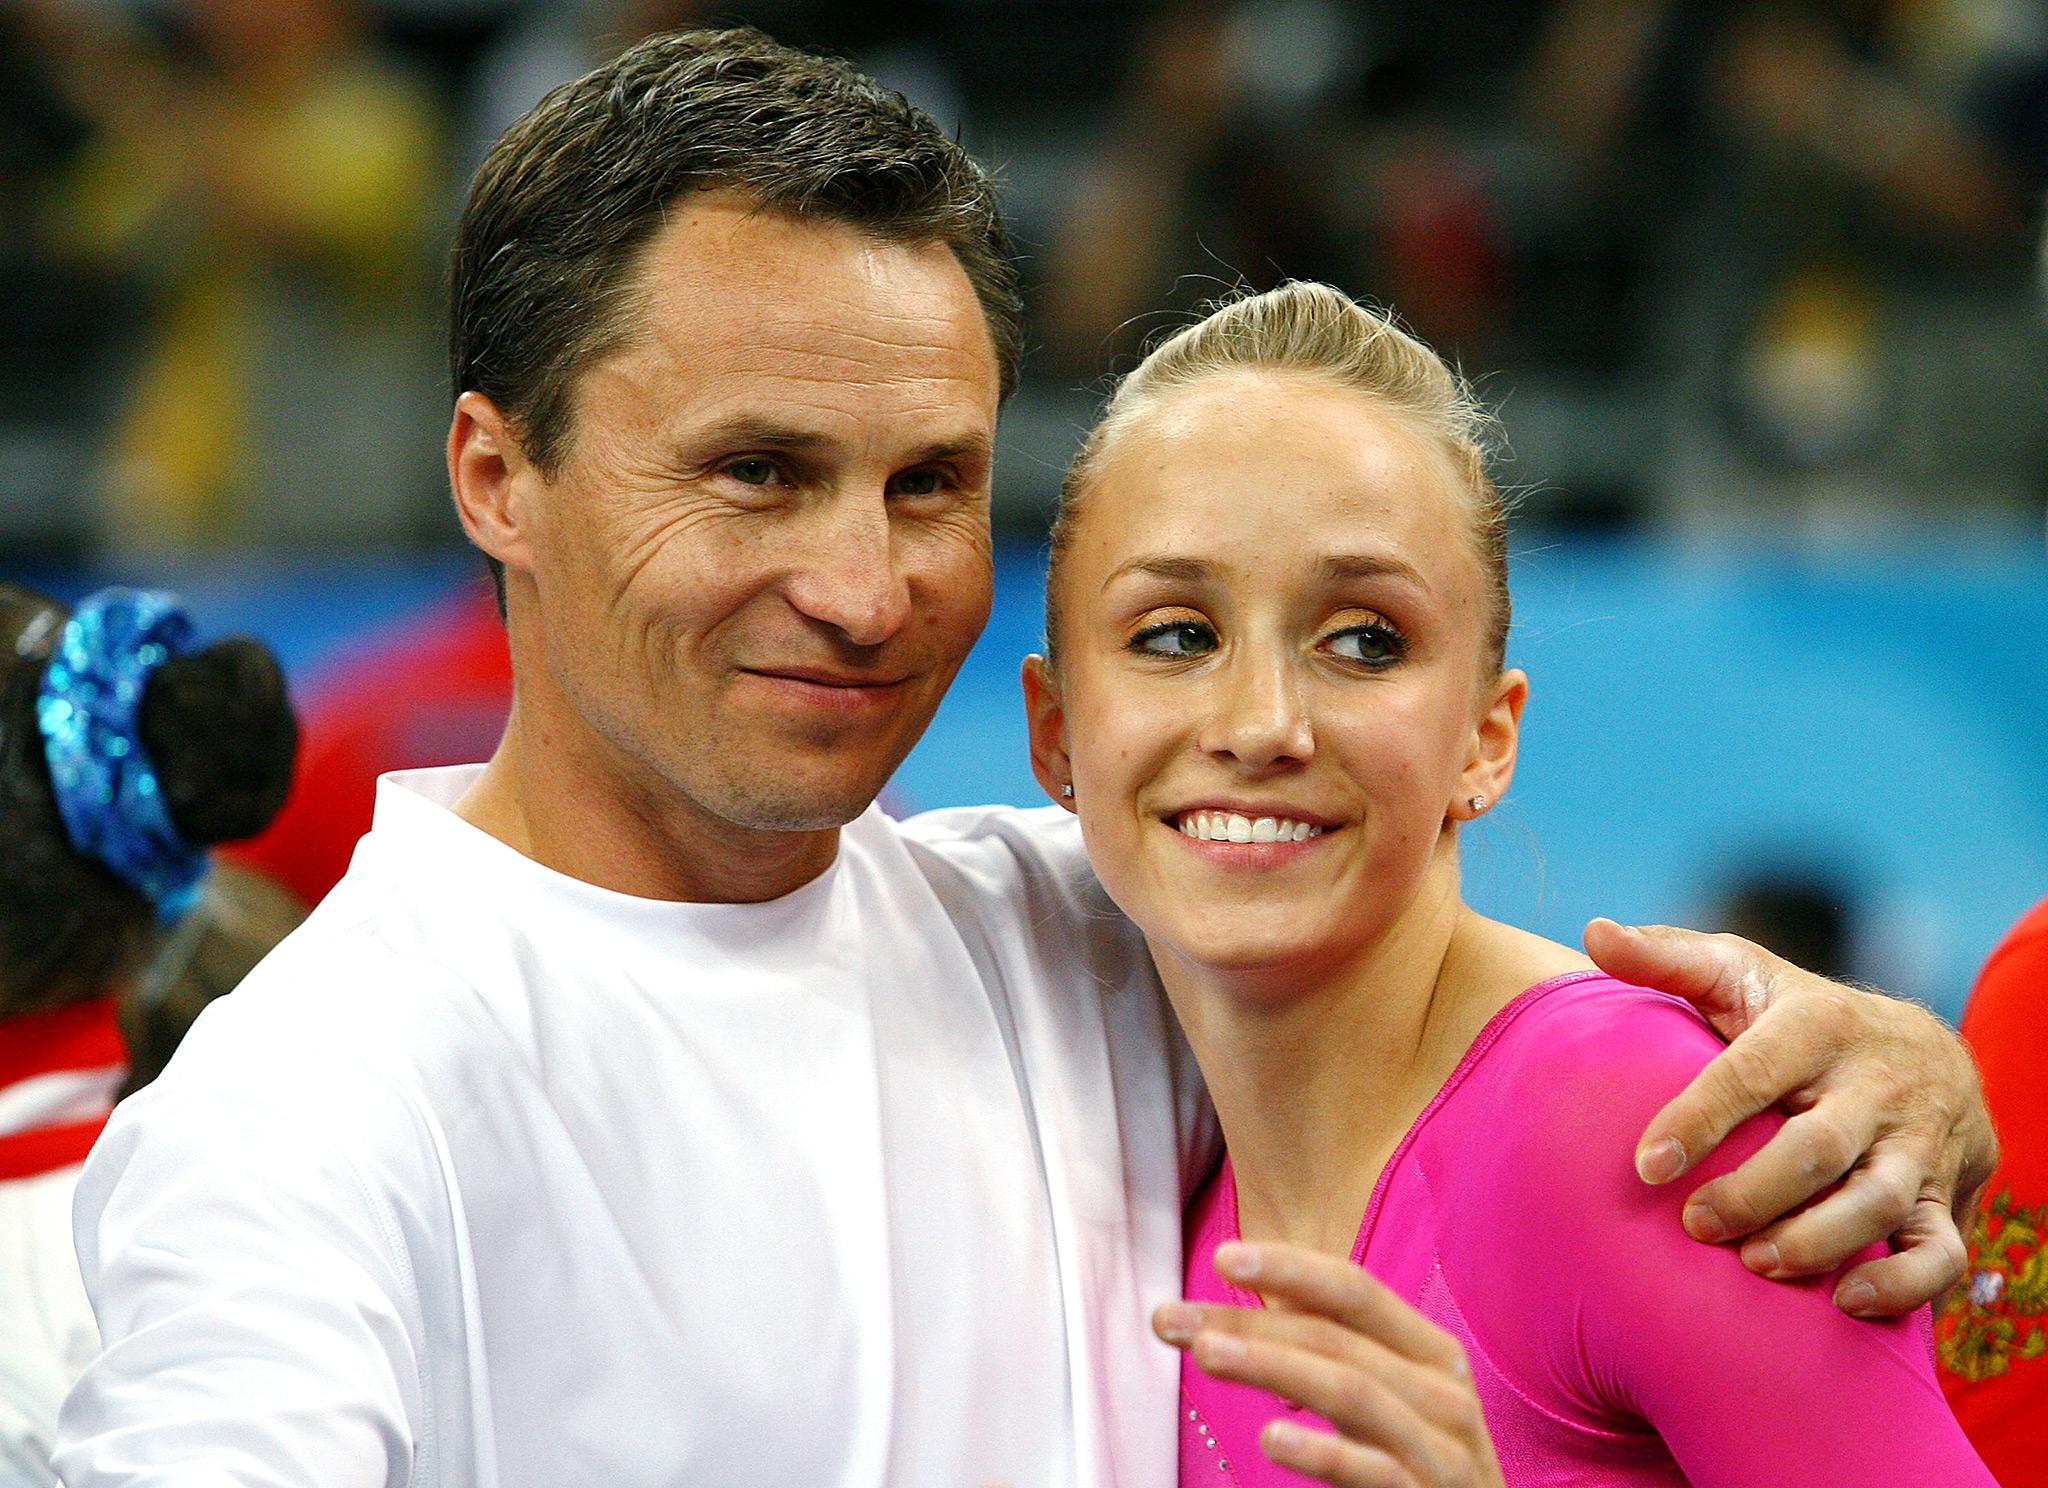 Nastia Liukin, 2008 Olympic gymnastics champion